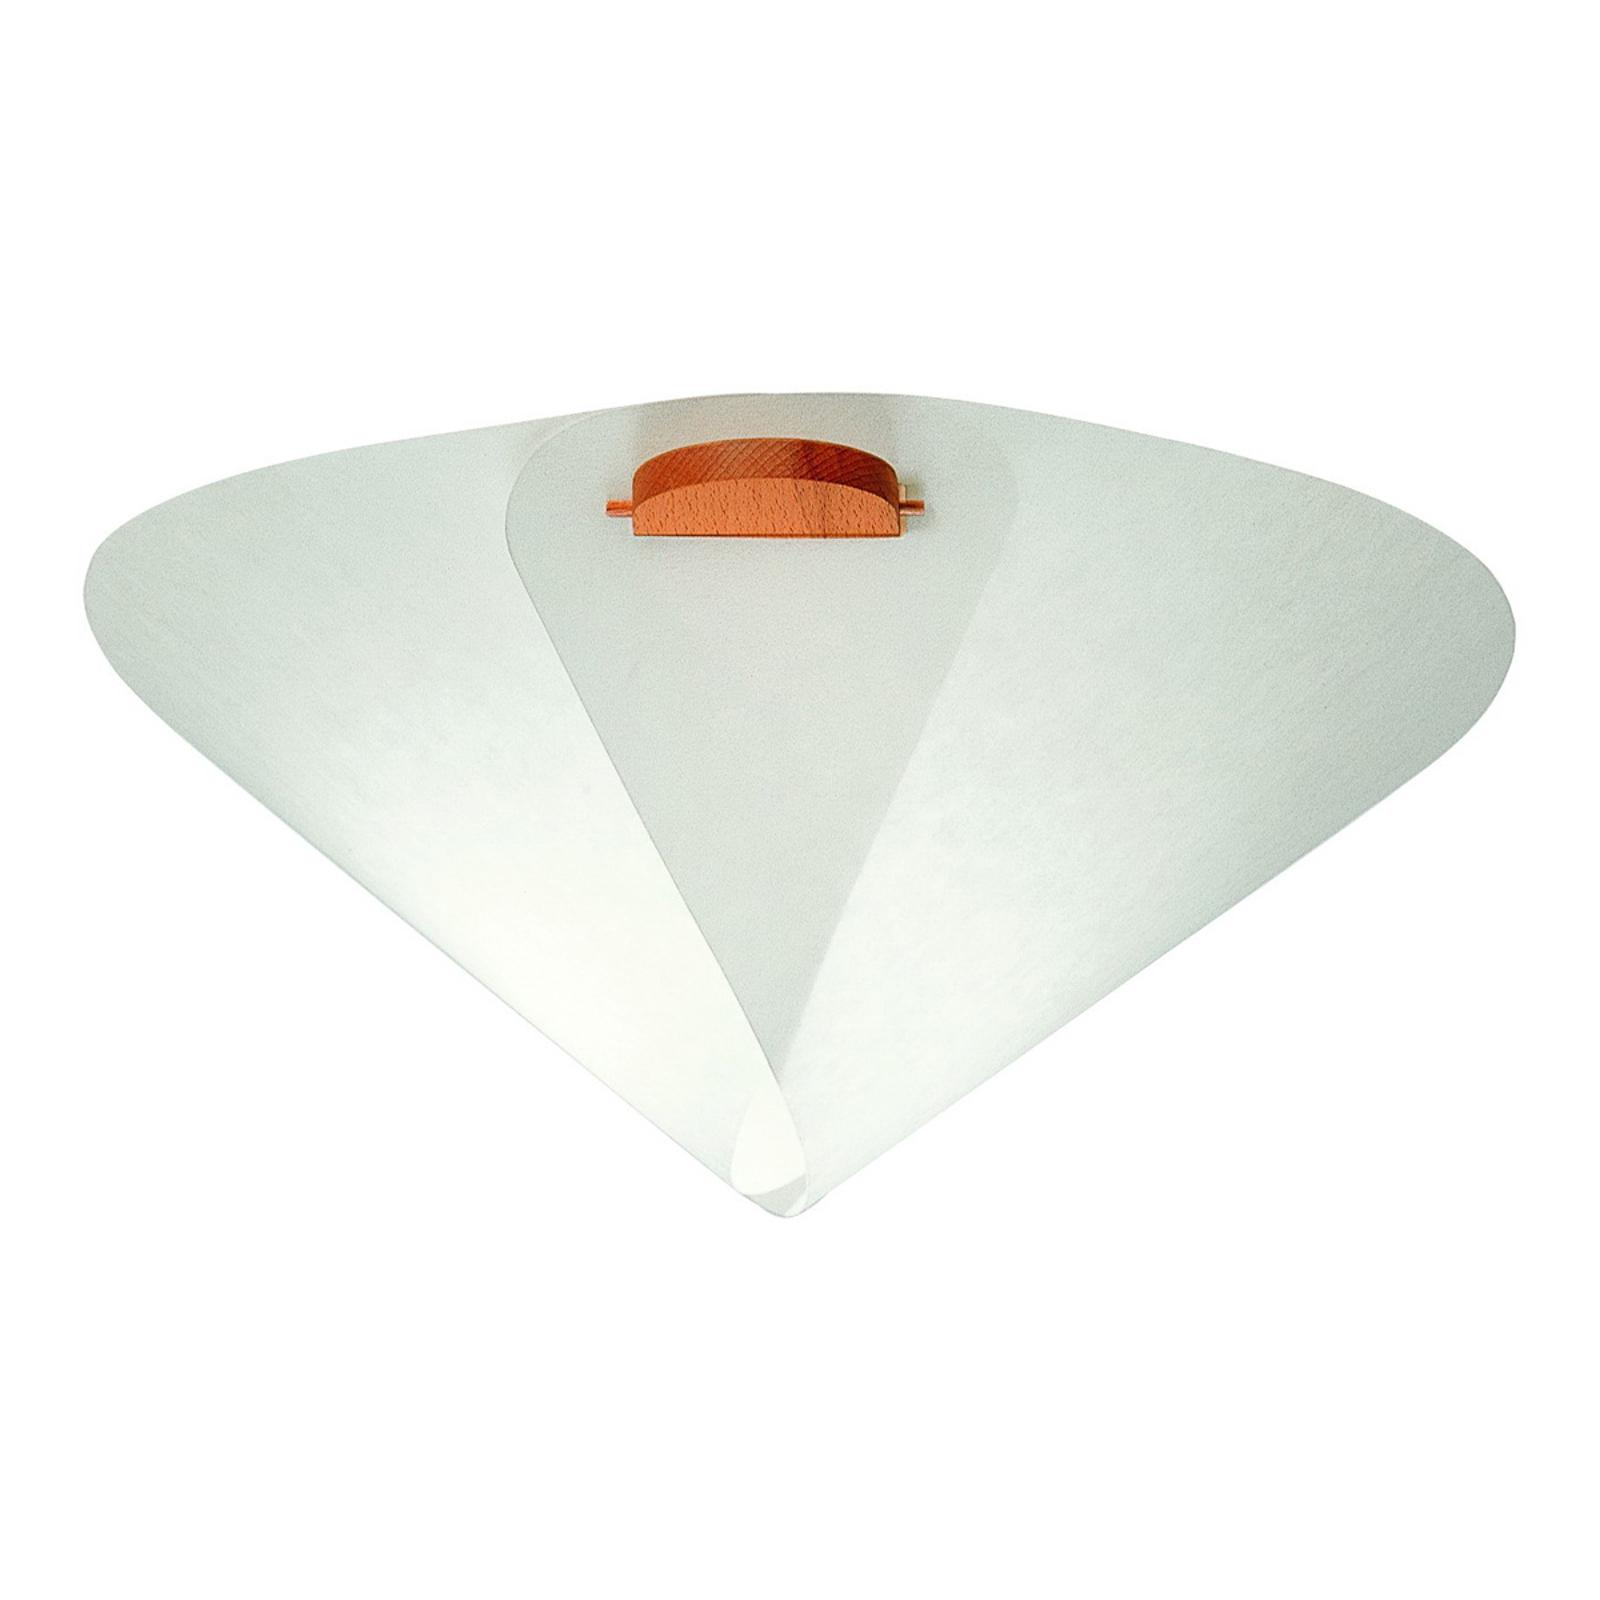 Kegleformet IRIS design-loftlampe